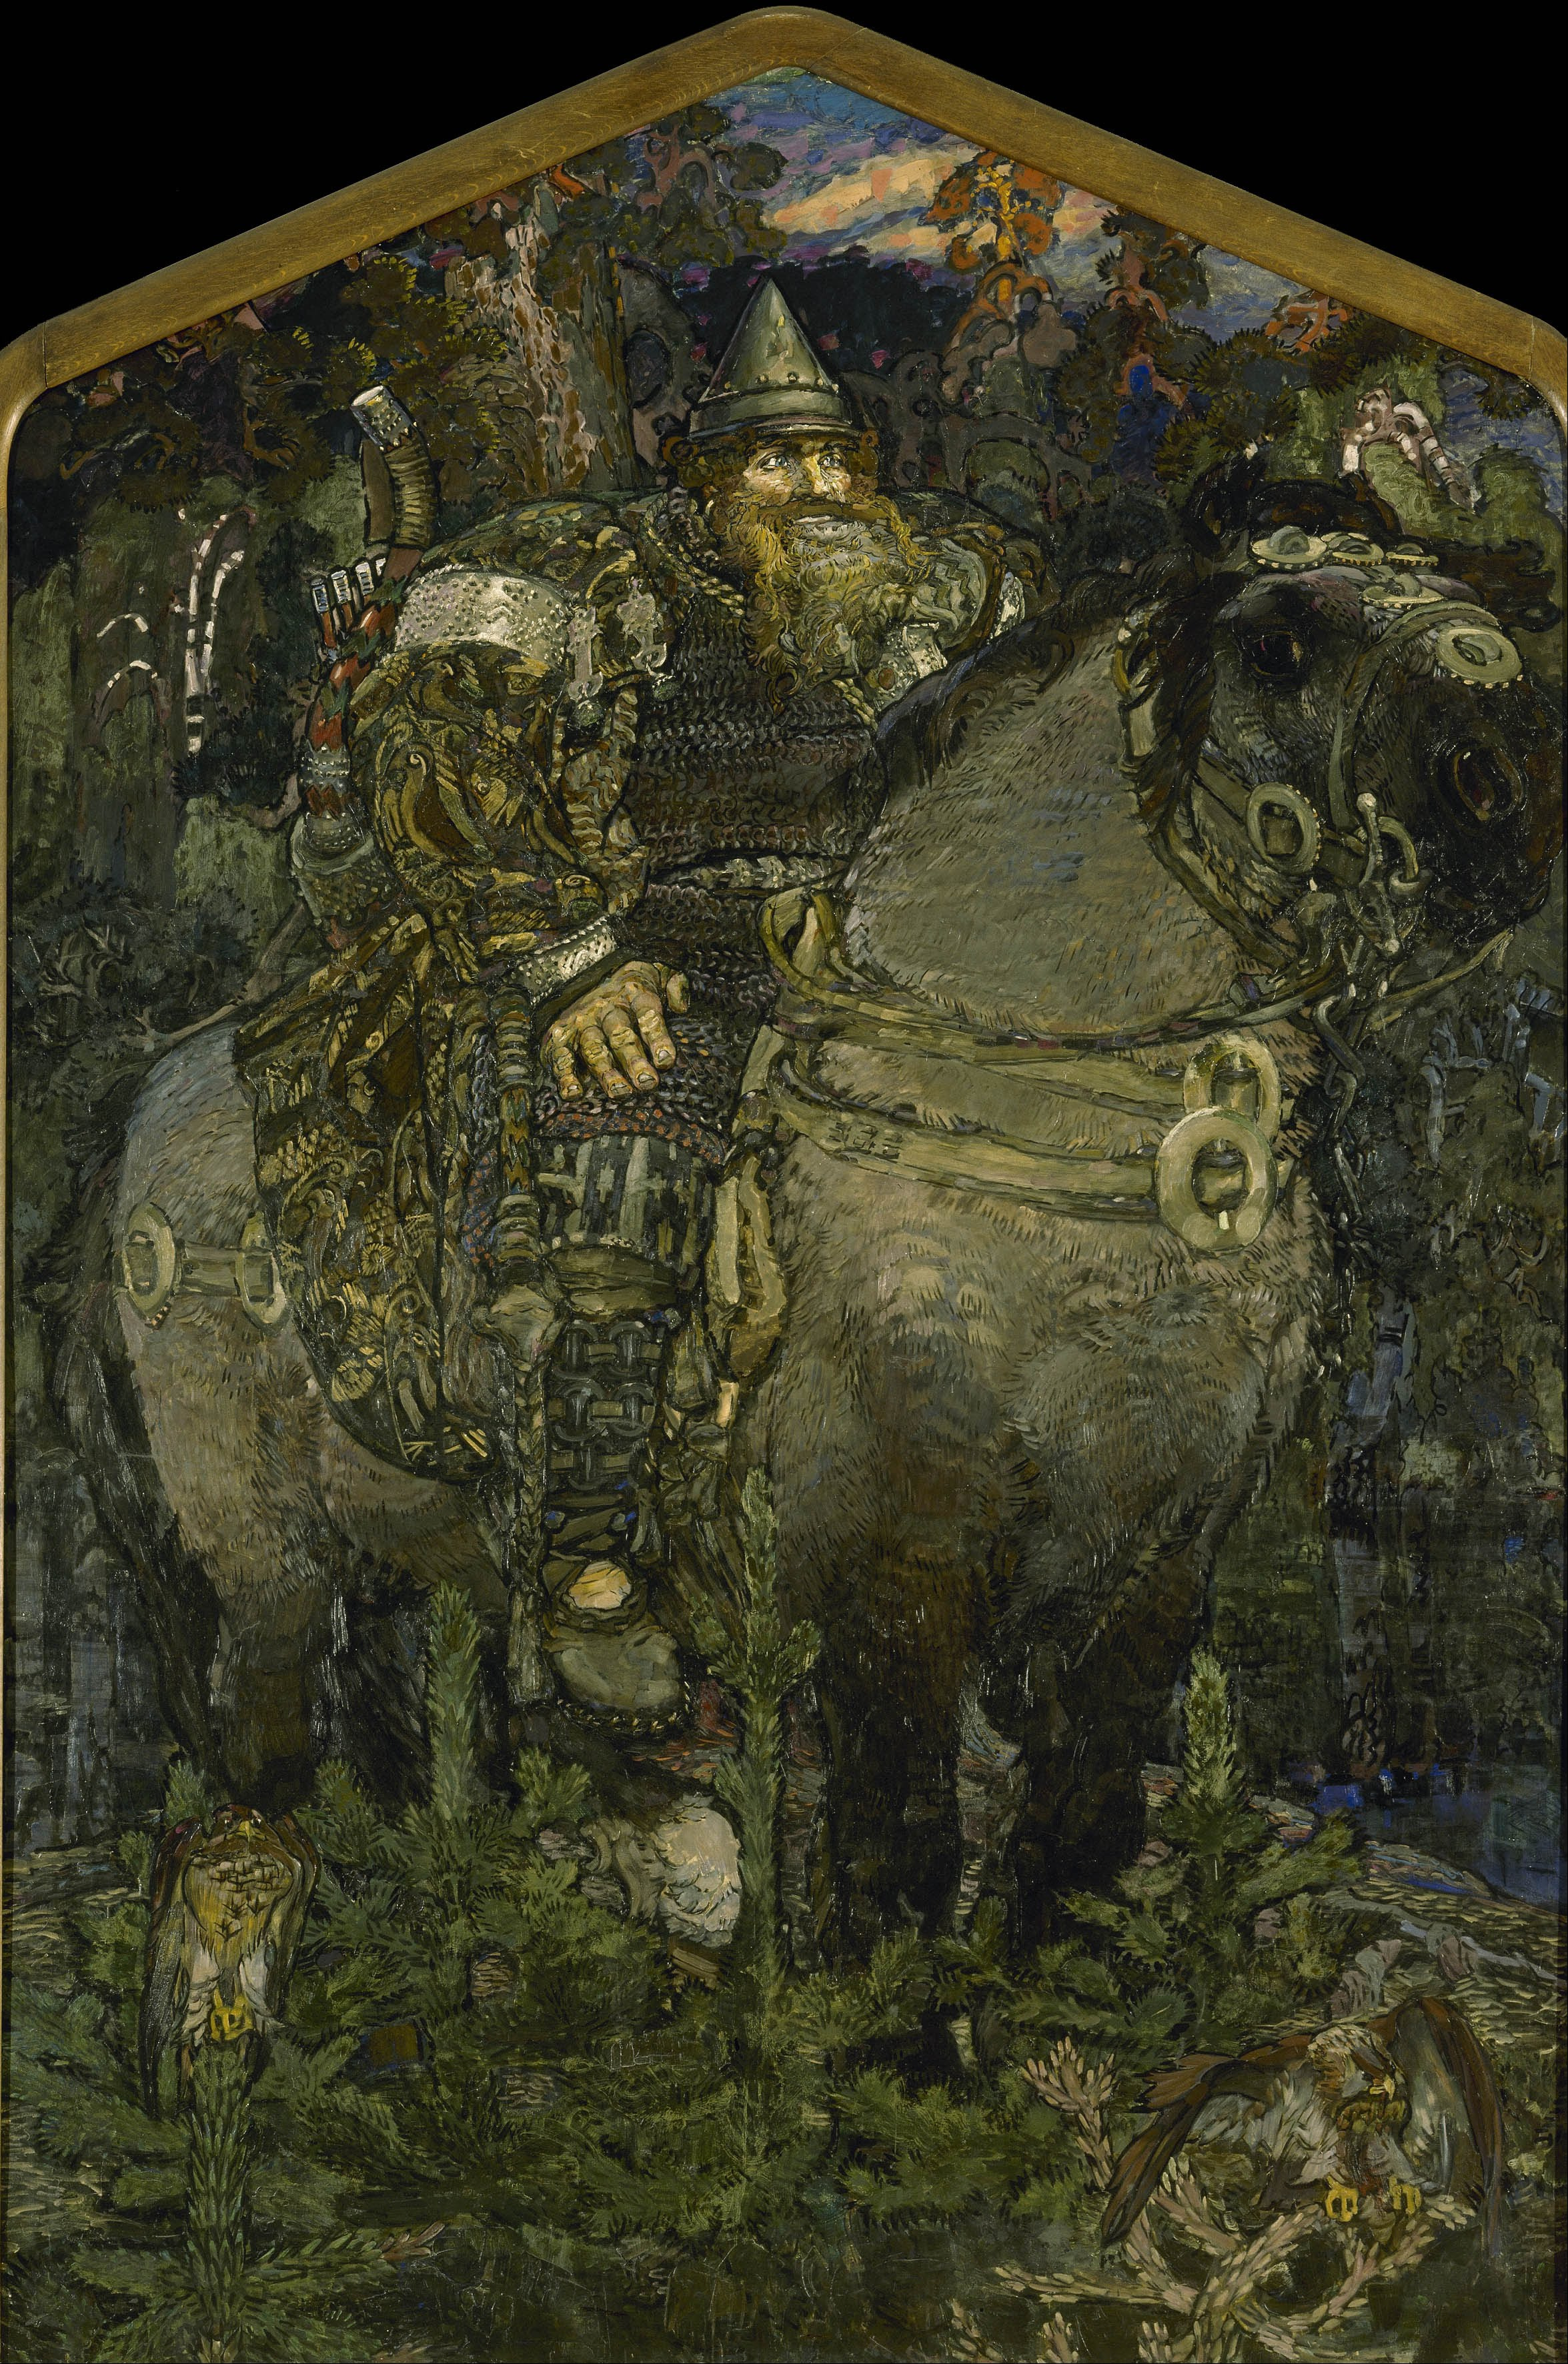 File:Mikhail Vrubel - Bogatyr - Google Art Project.jpg - Wikimedia ...: commons.wikimedia.org/wiki/file:mikhail_vrubel_-_bogatyr_-_google...